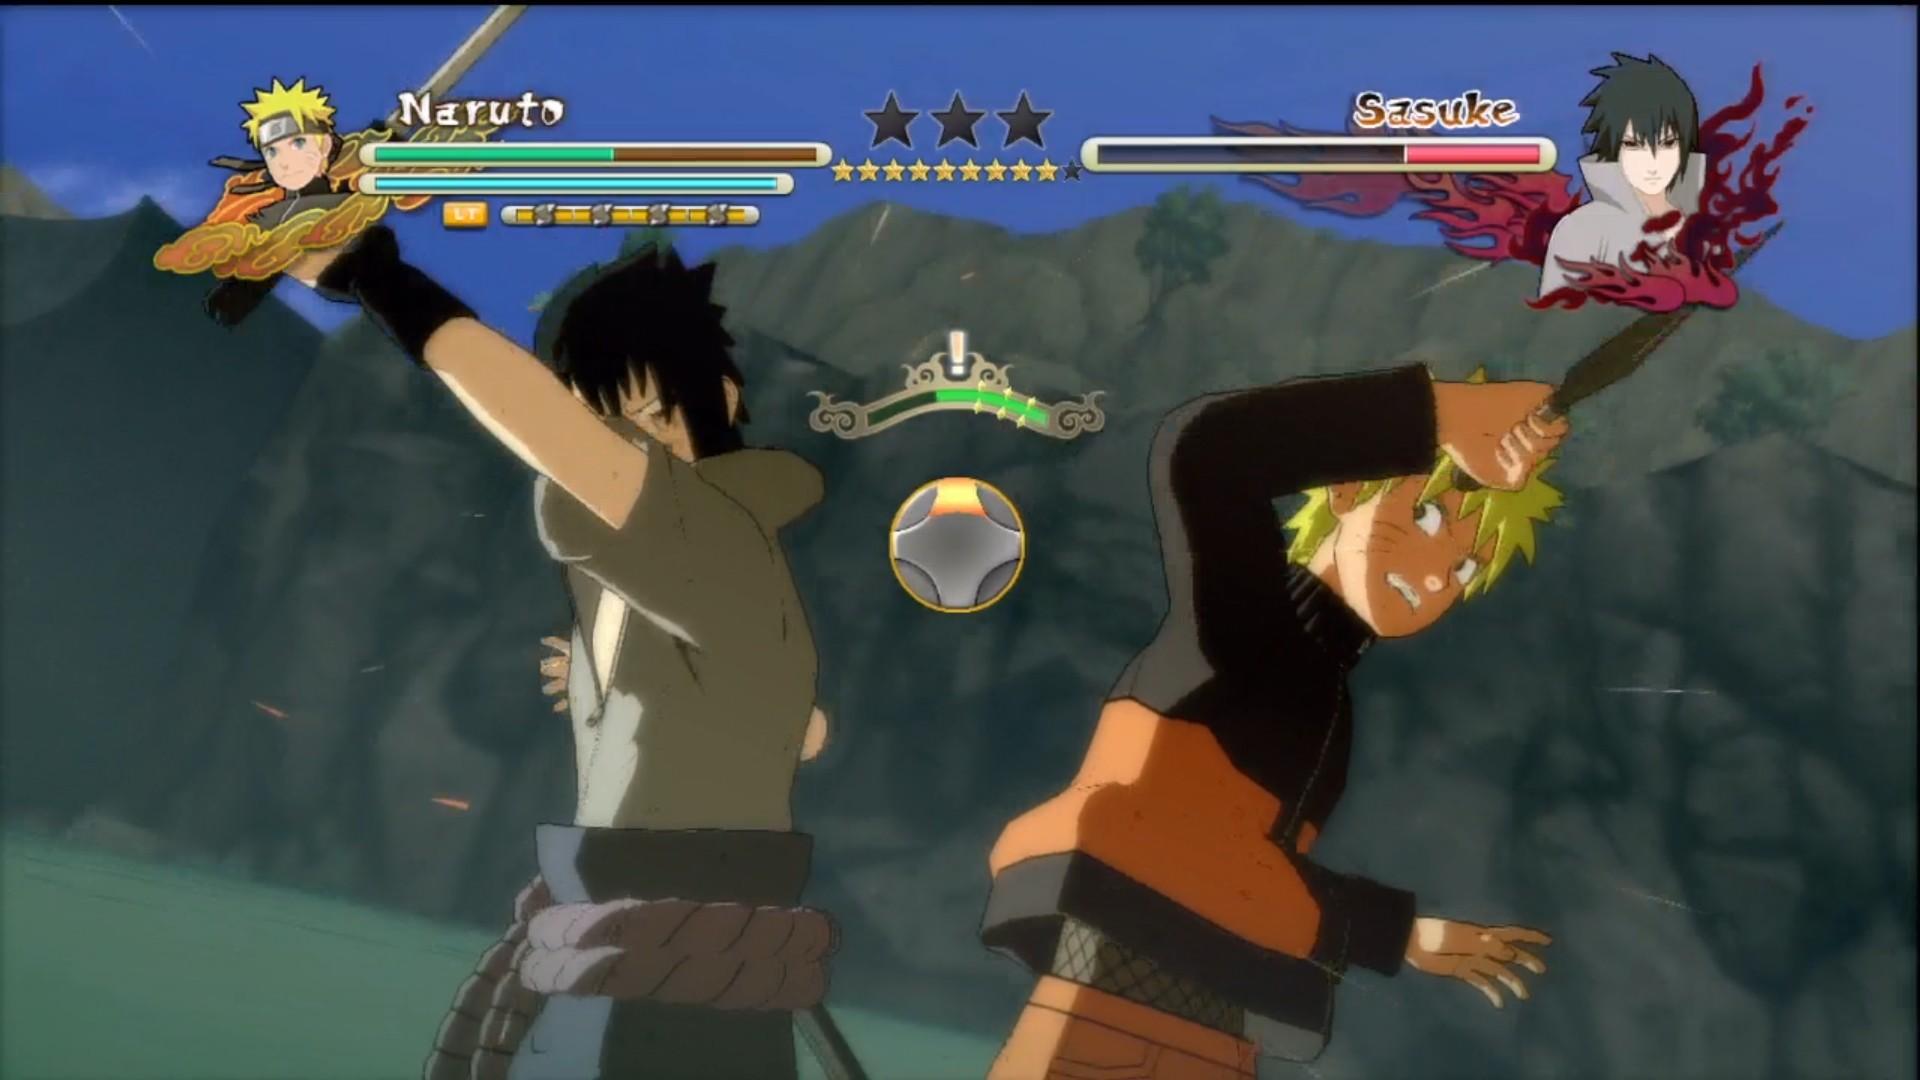 download free game naruto shippuden ultimate ninja storm 3 pc